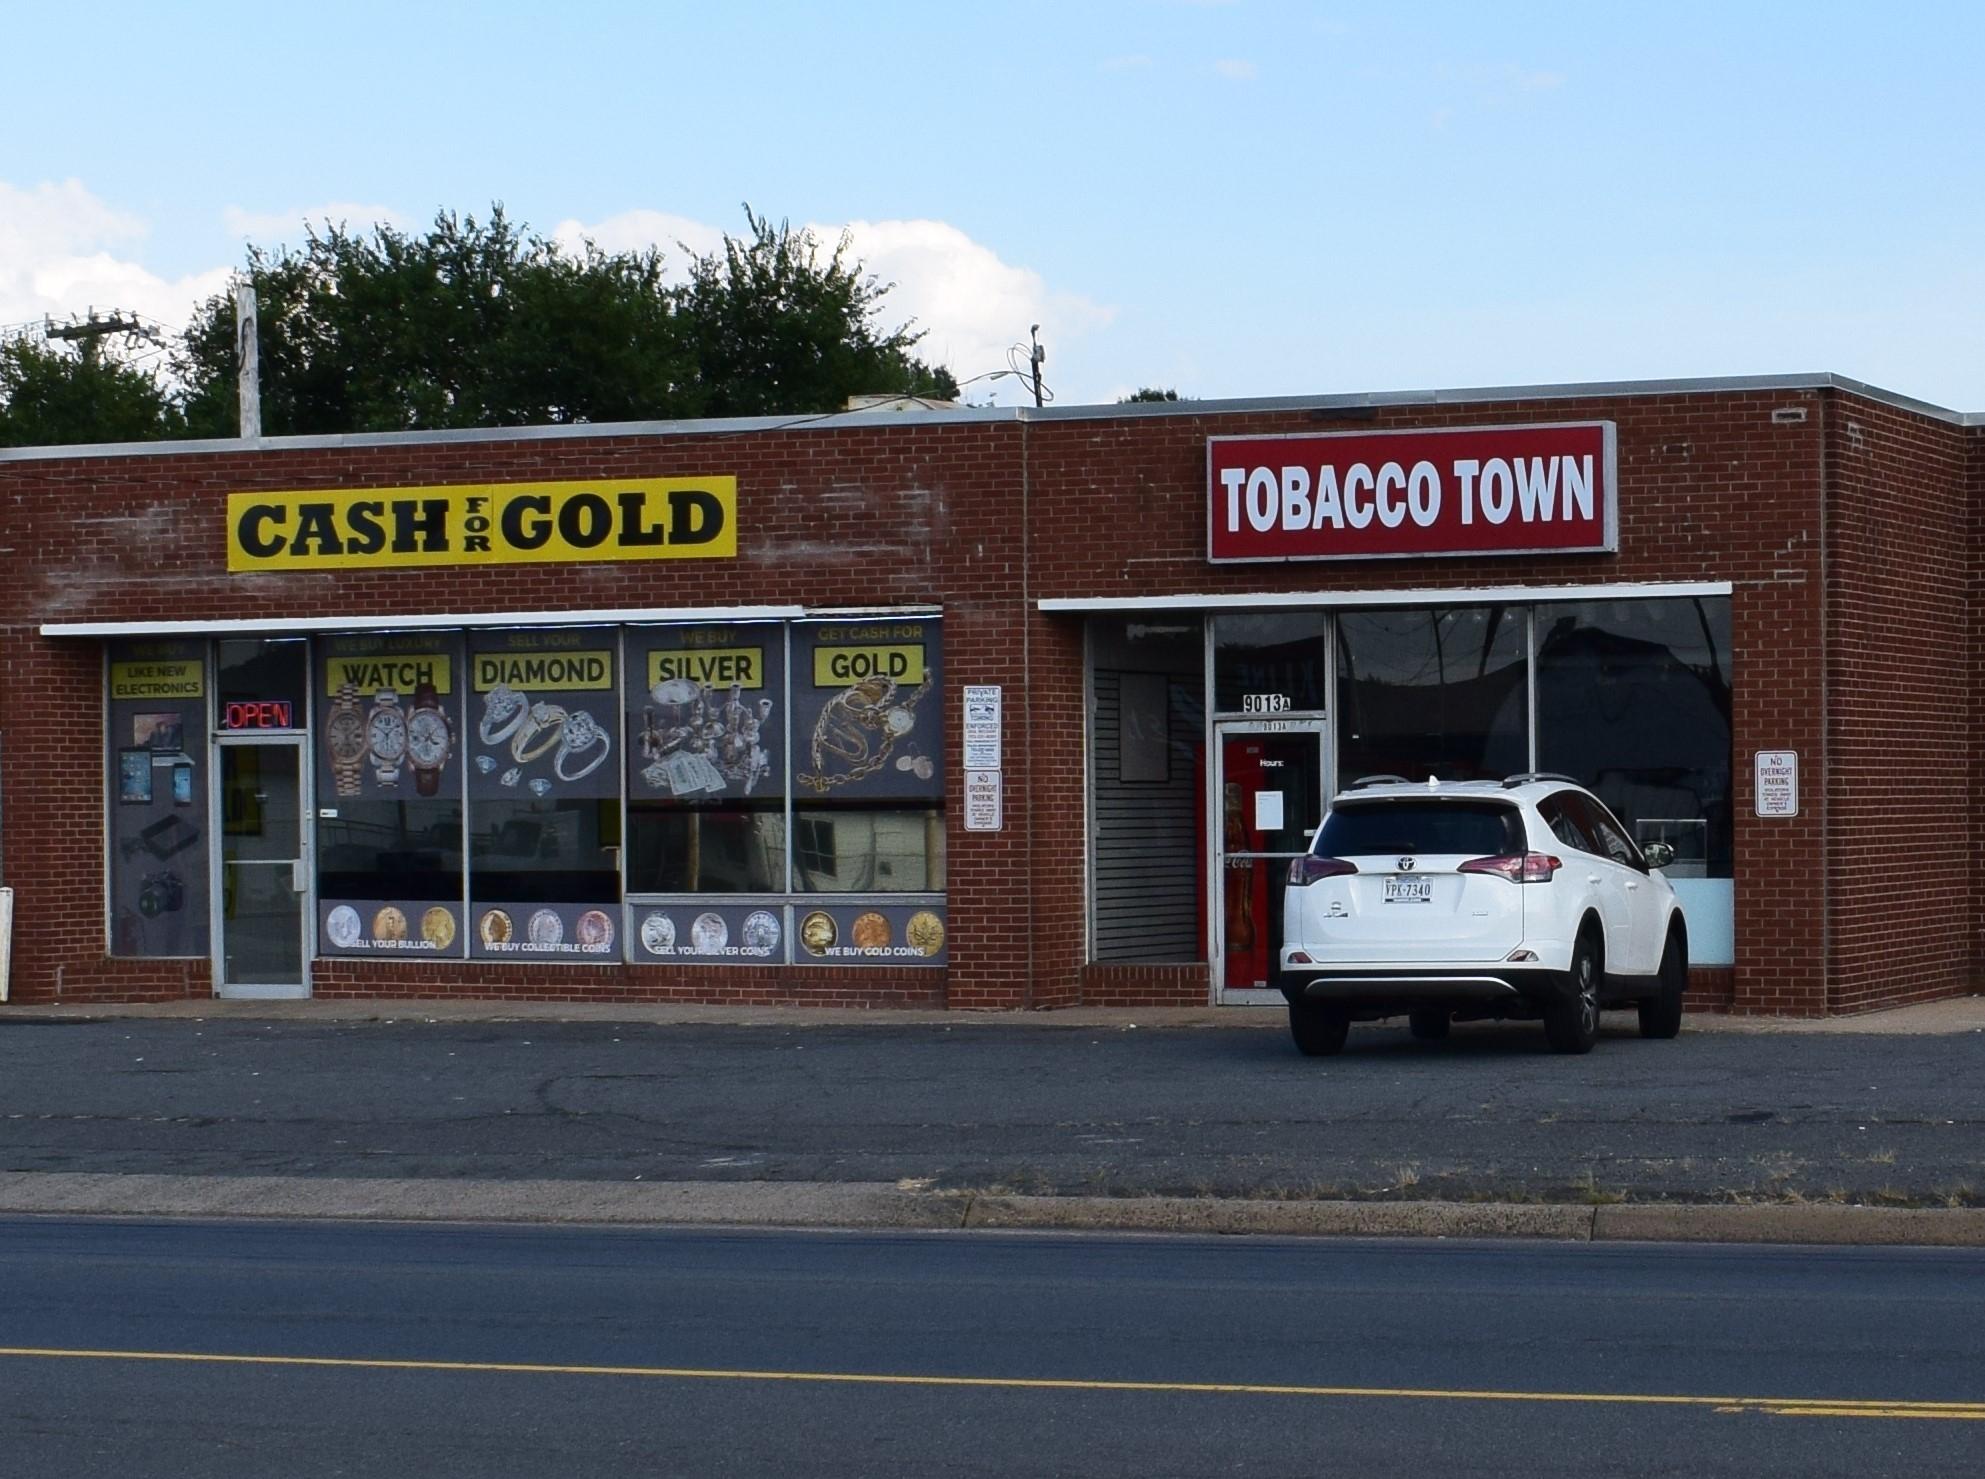 Cash For Gold image 5